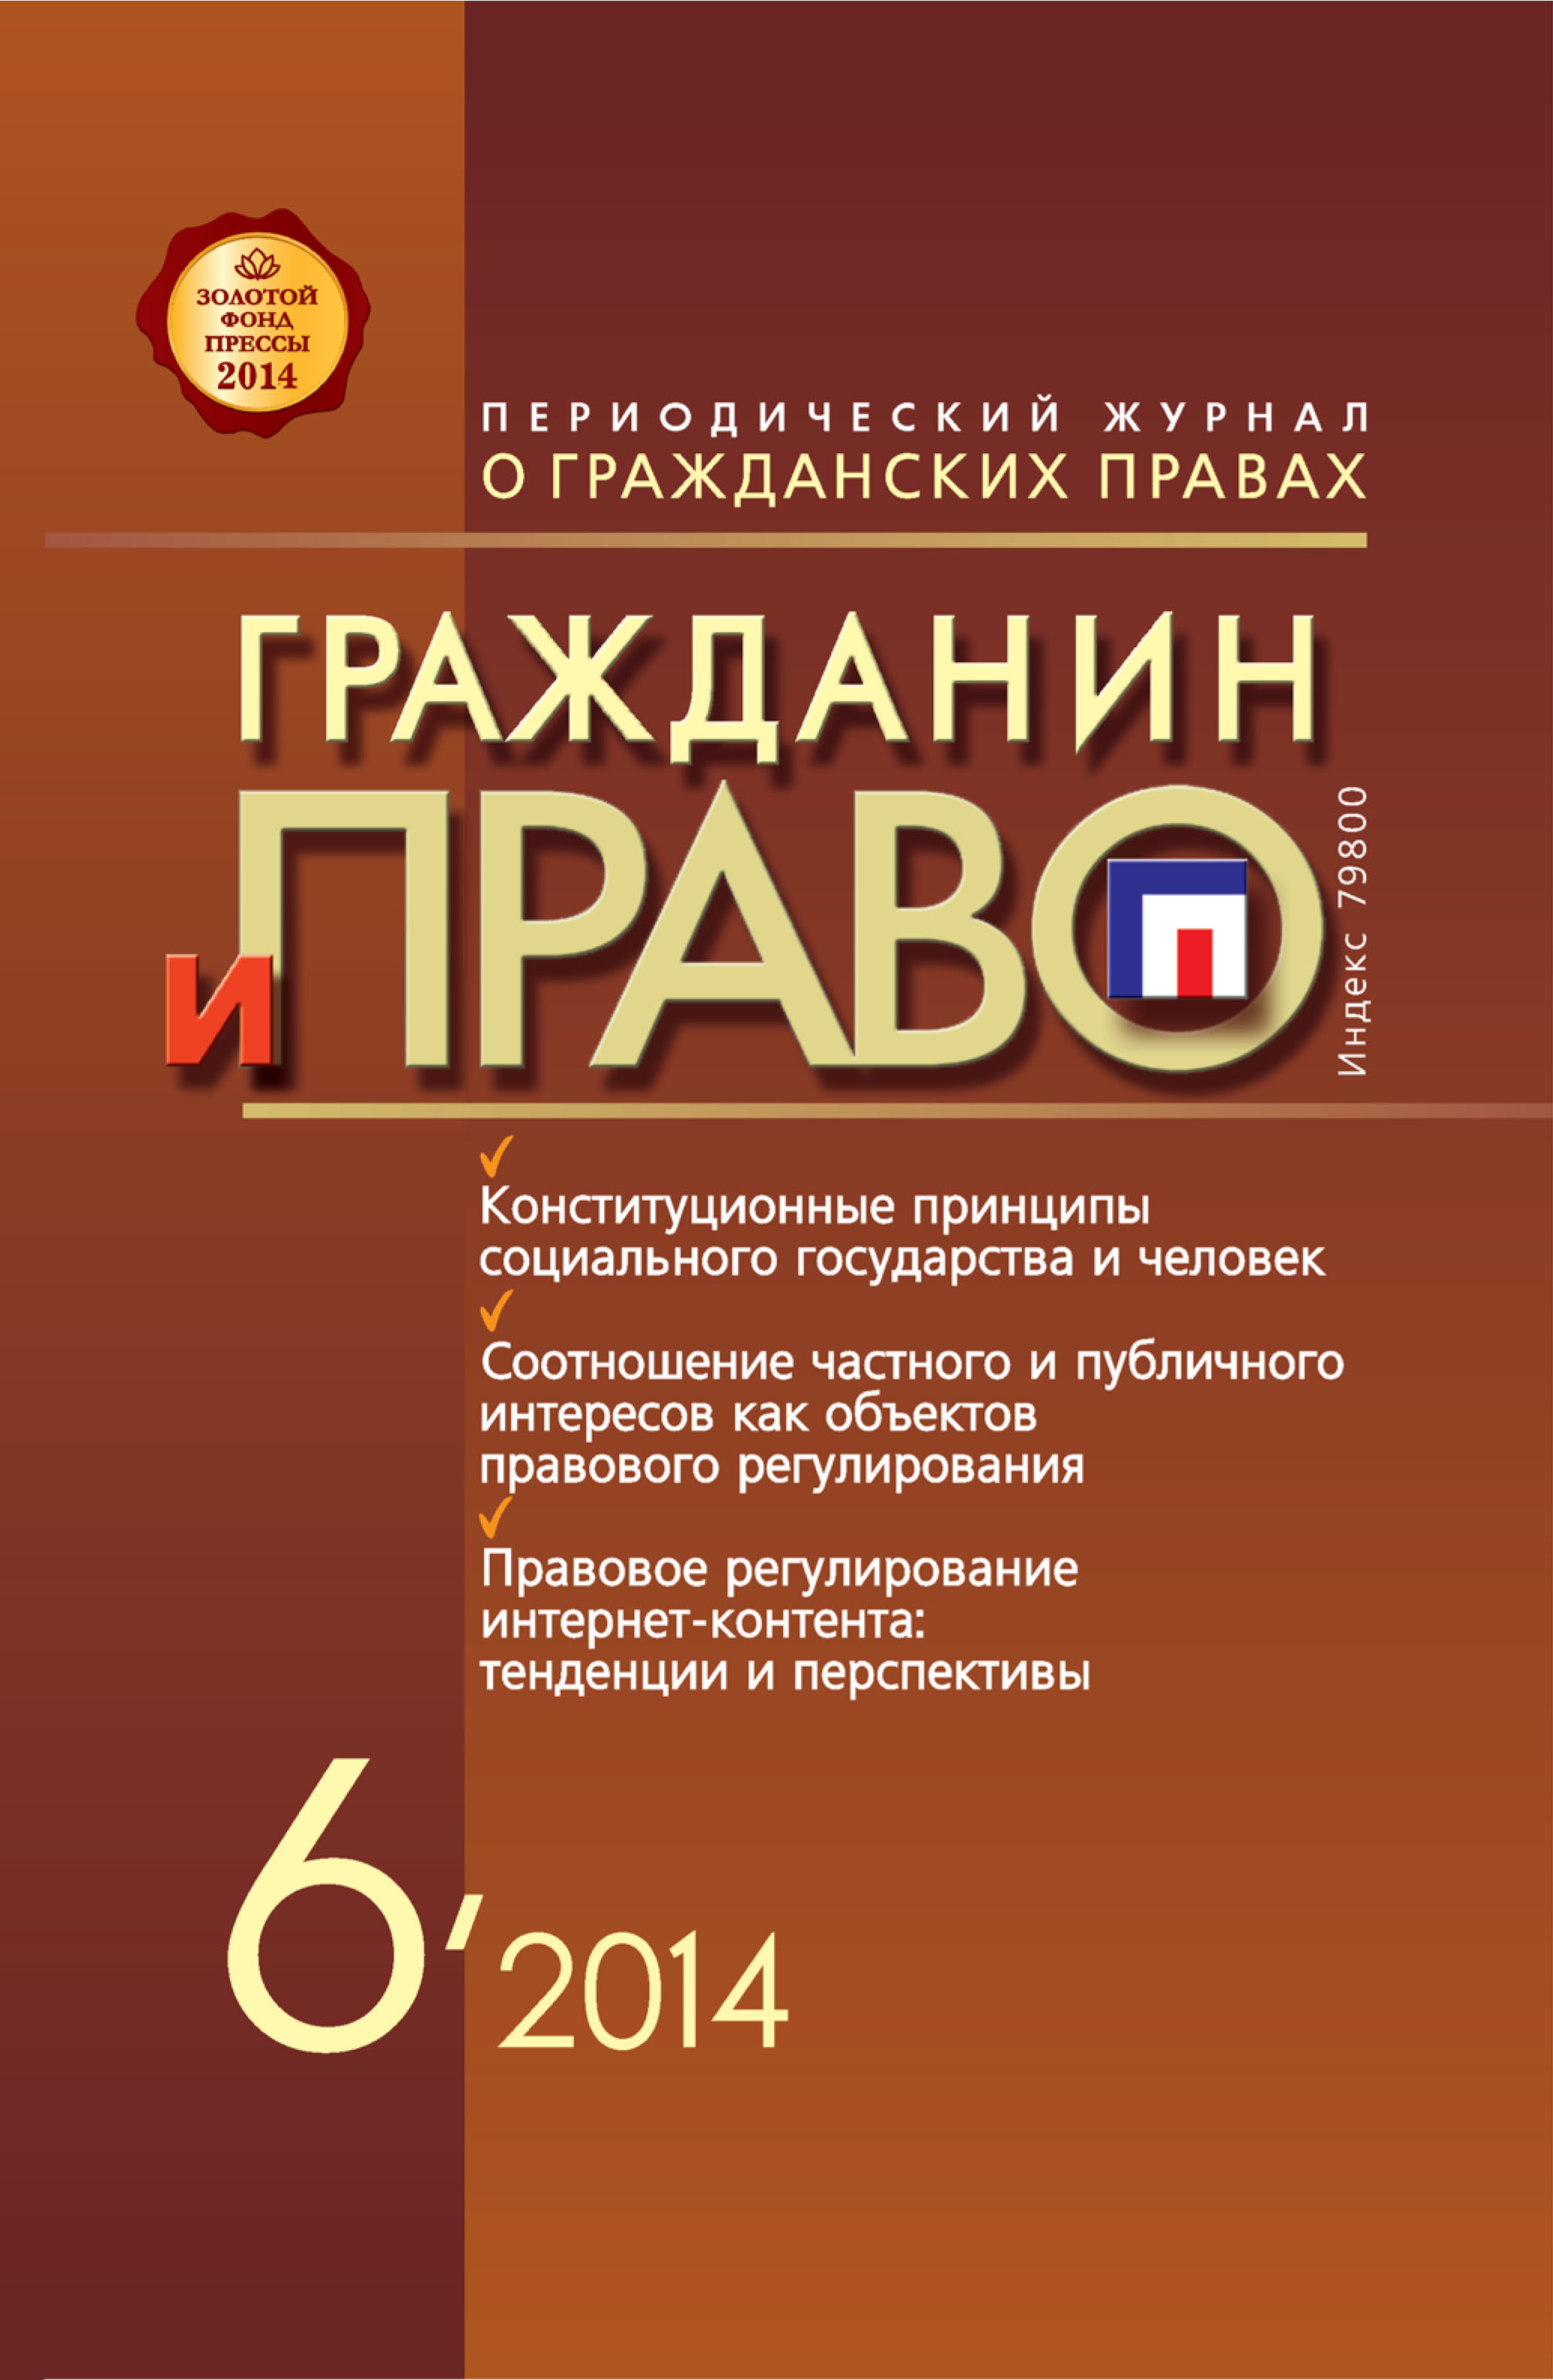 Гражданин и право №06/2014